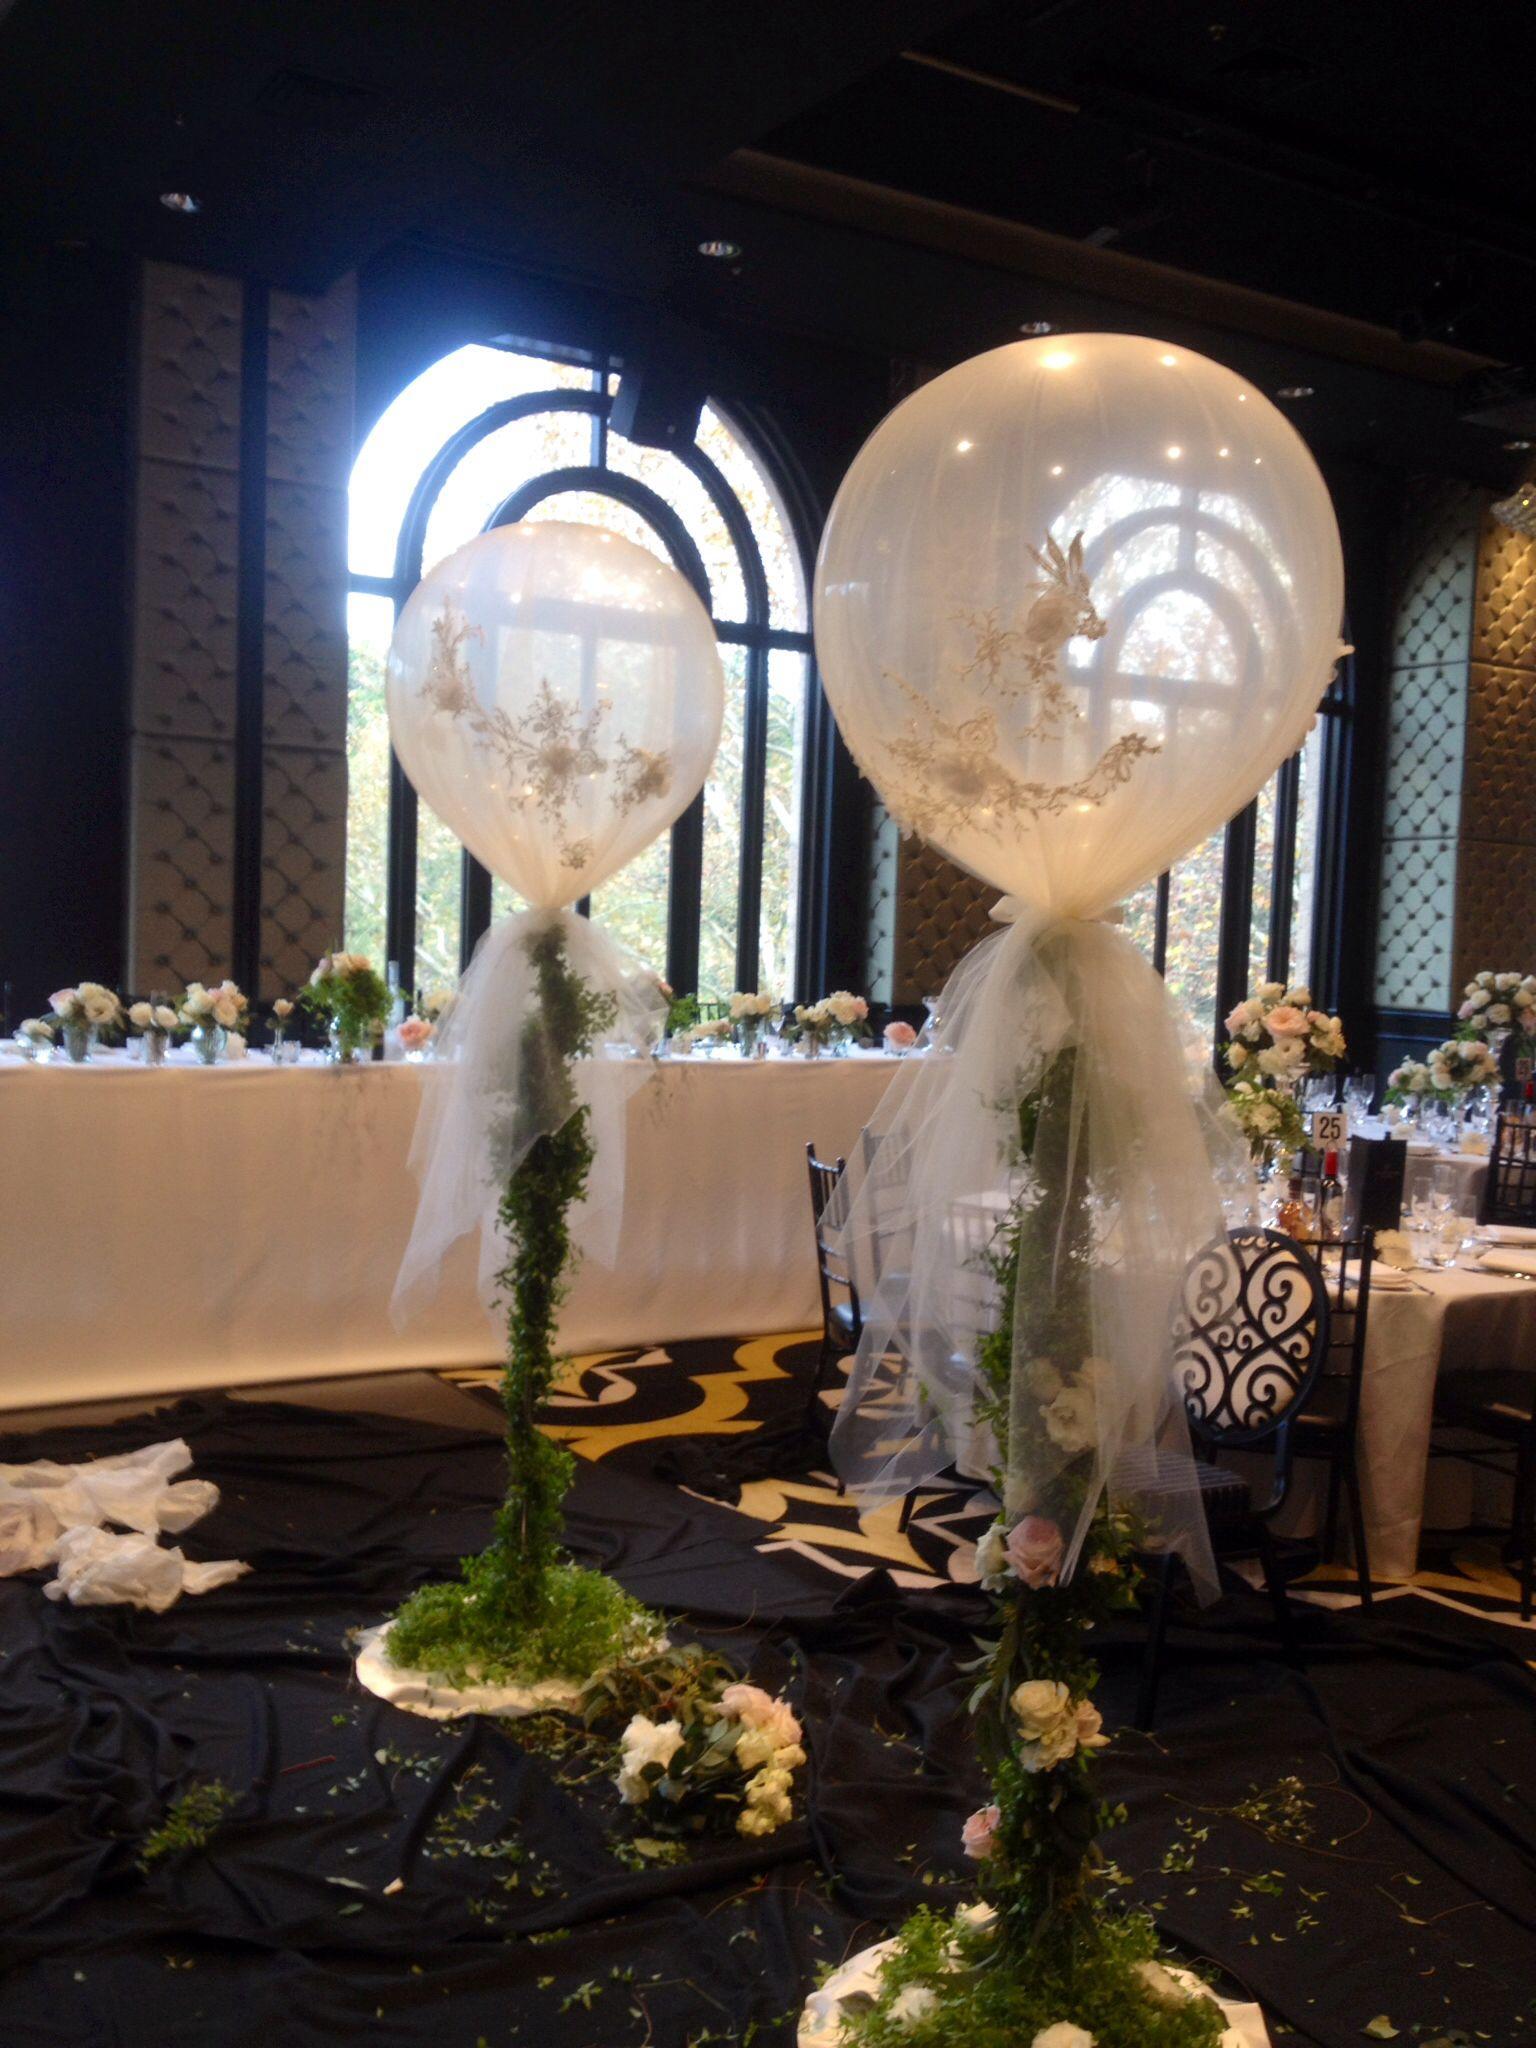 Gorgeous tulle wrapped around ft diamond clear balloons